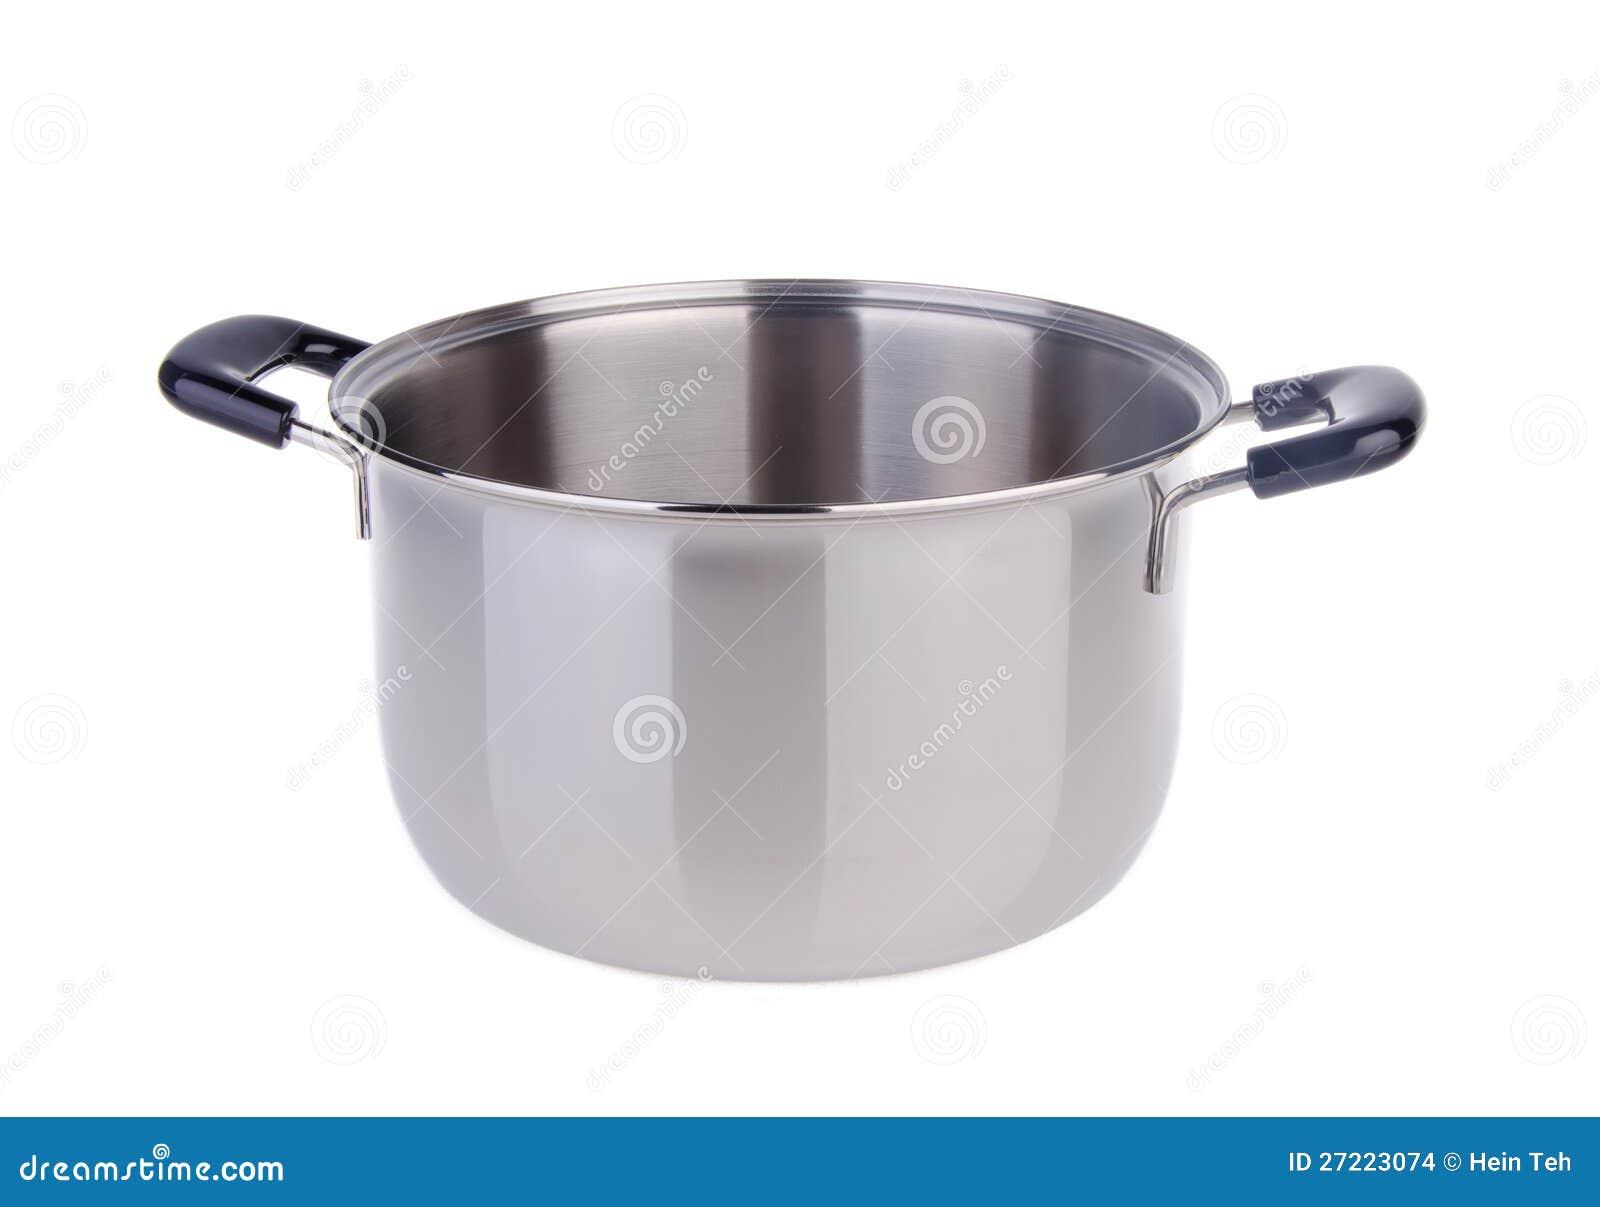 stainless steel cooking pot stock images image 27223074. Black Bedroom Furniture Sets. Home Design Ideas